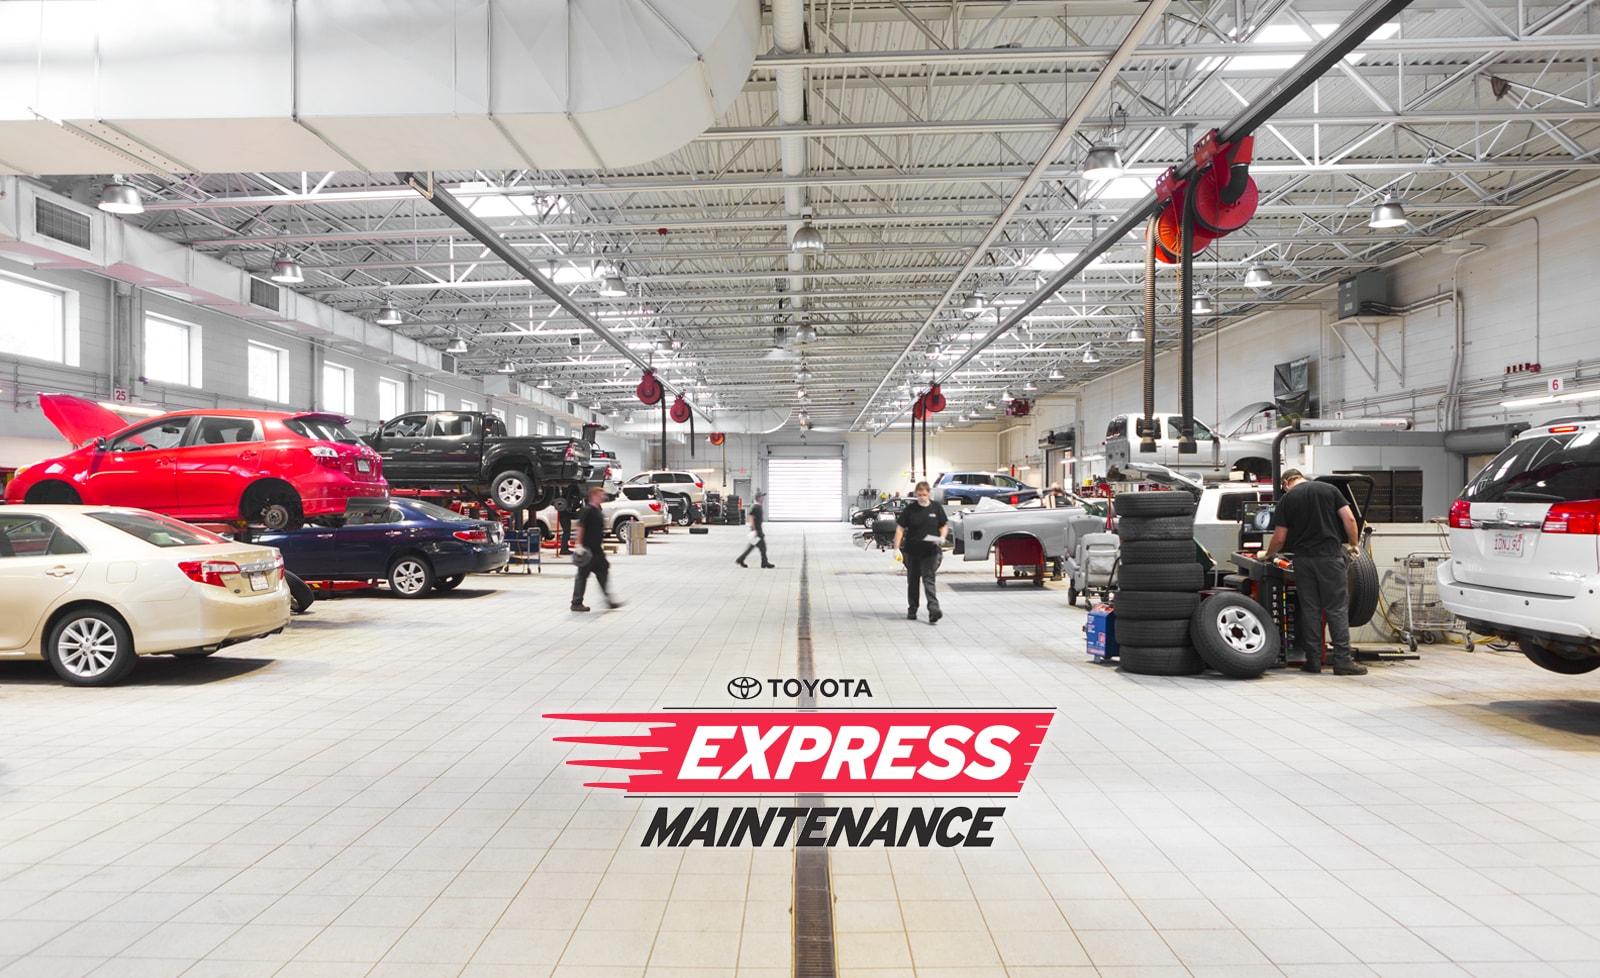 Acton Toyota Service >> Toyota Service Center | Acton Toyota of Littleton Service Department | Toyota Car Repair Facility